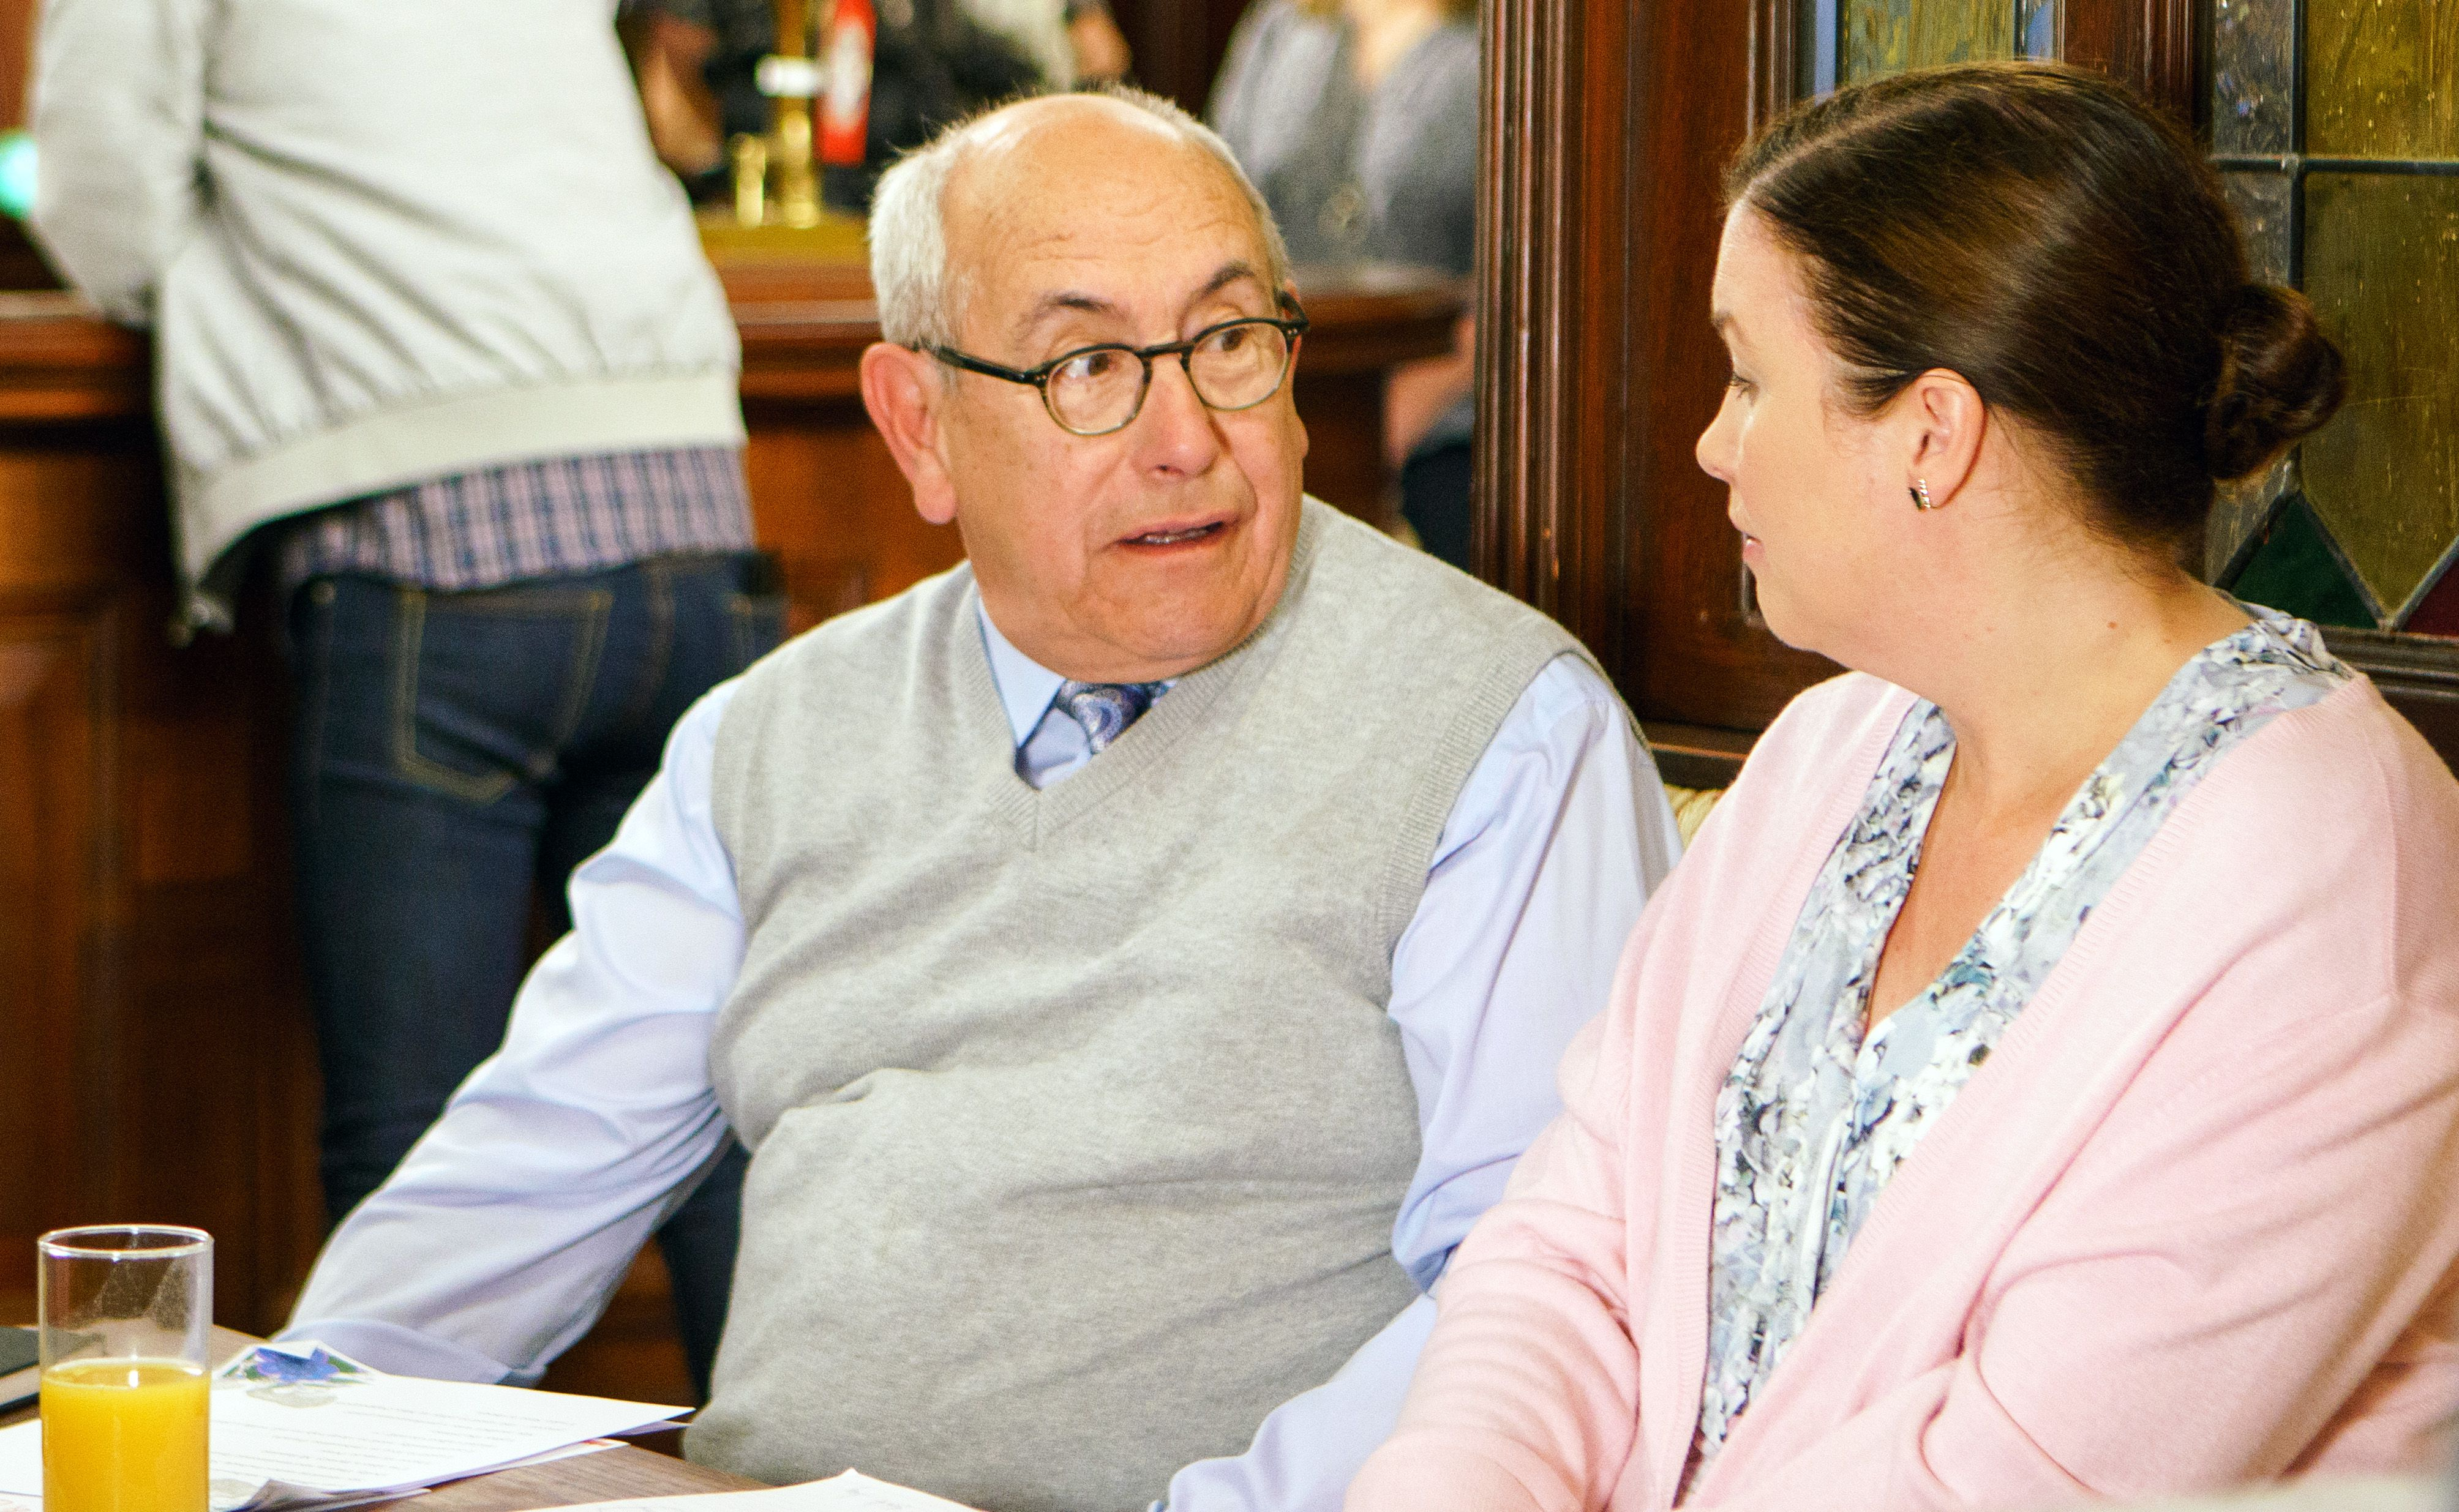 Coronation Street spoilers: Show boss reveals details on Norris Cole's return storyline